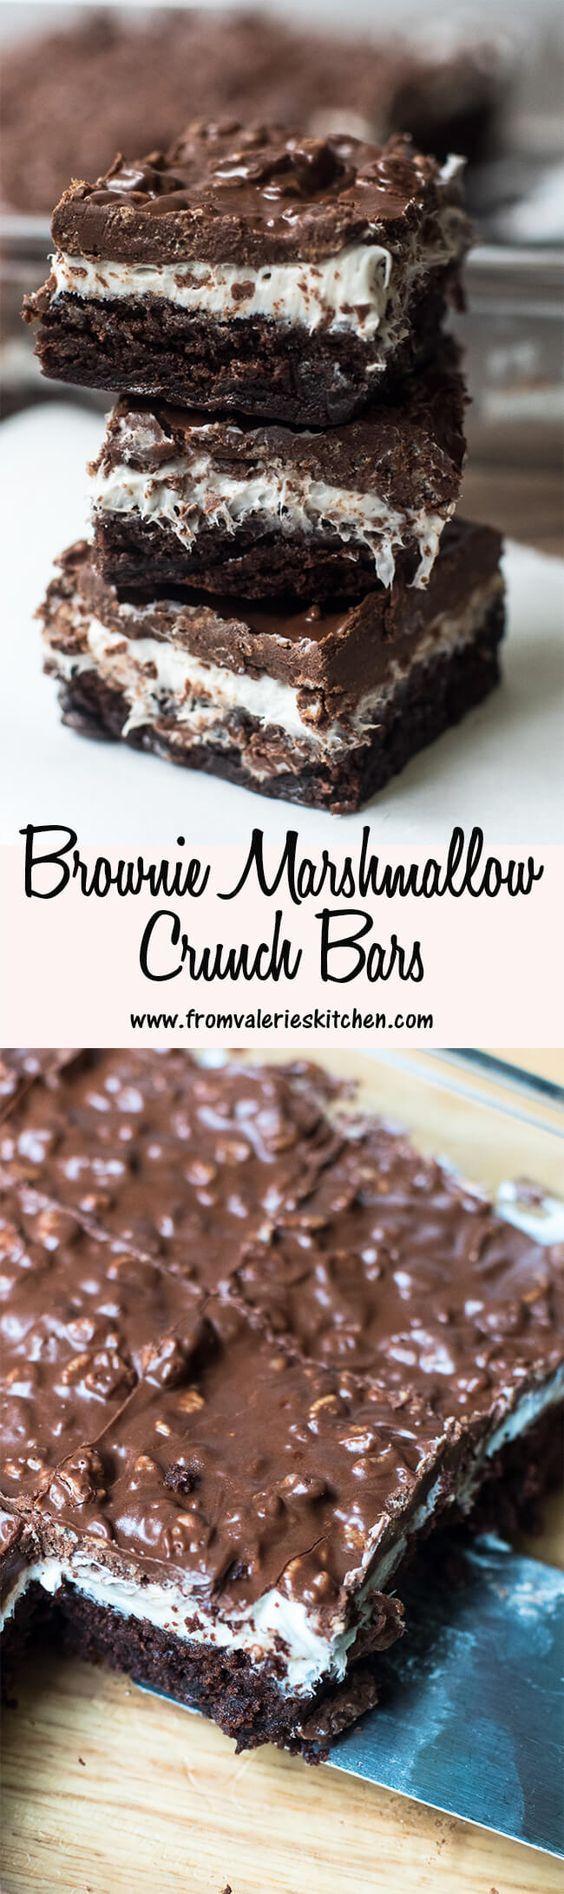 Brownie Marshmallow Crunch Bars ~ #MixUpaMoment #sp @Pillsbury  http://www.fromvalerieskitchen.com